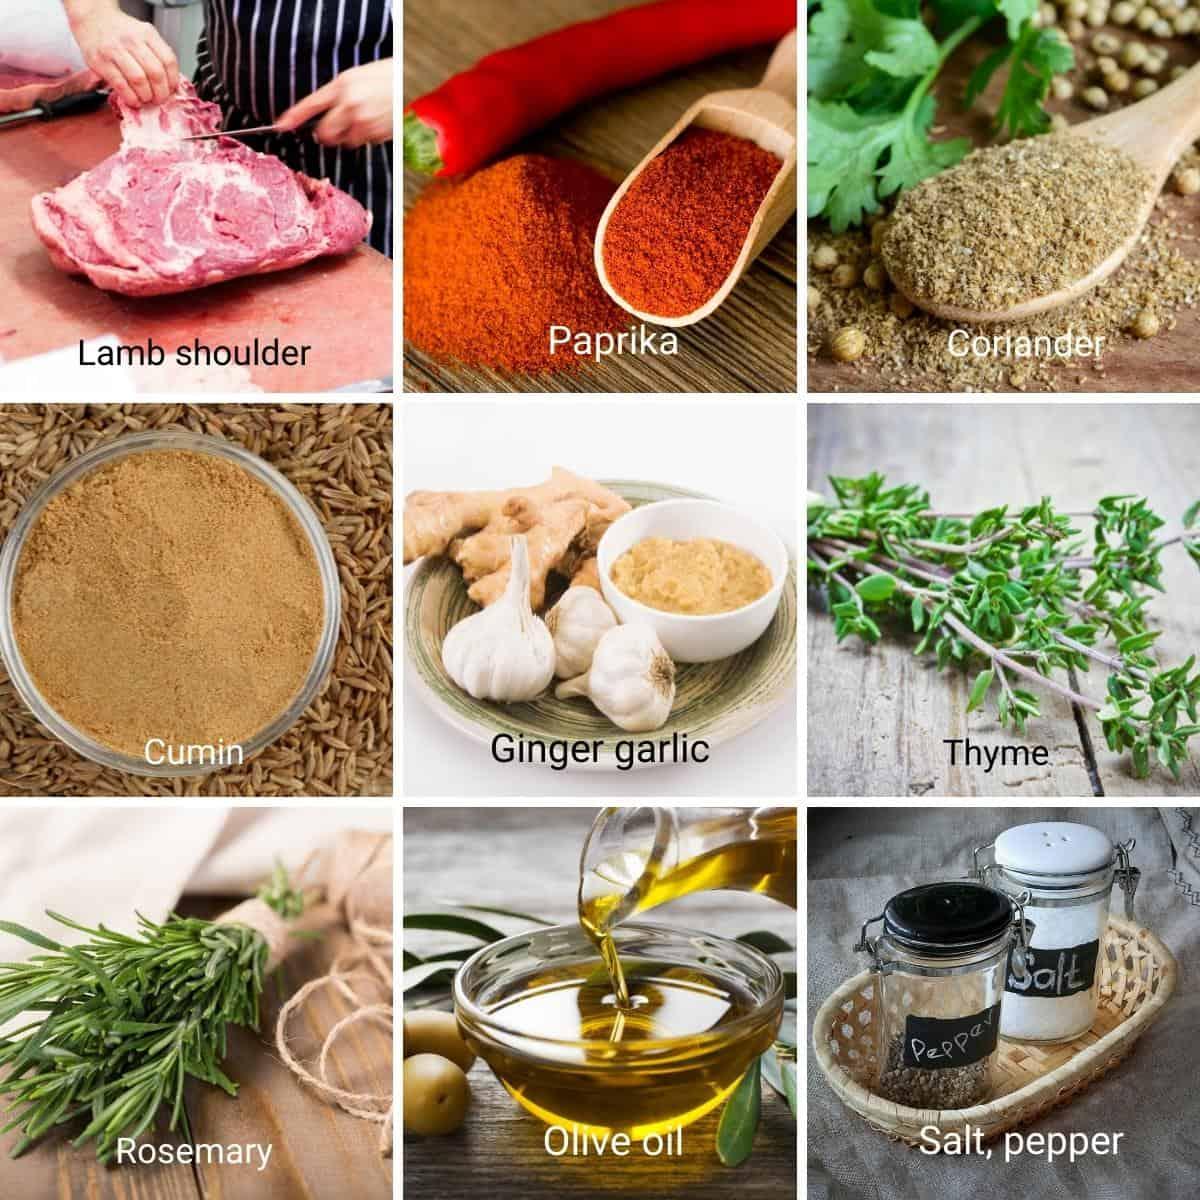 Ingredients needed to make lamb roast shoulder.